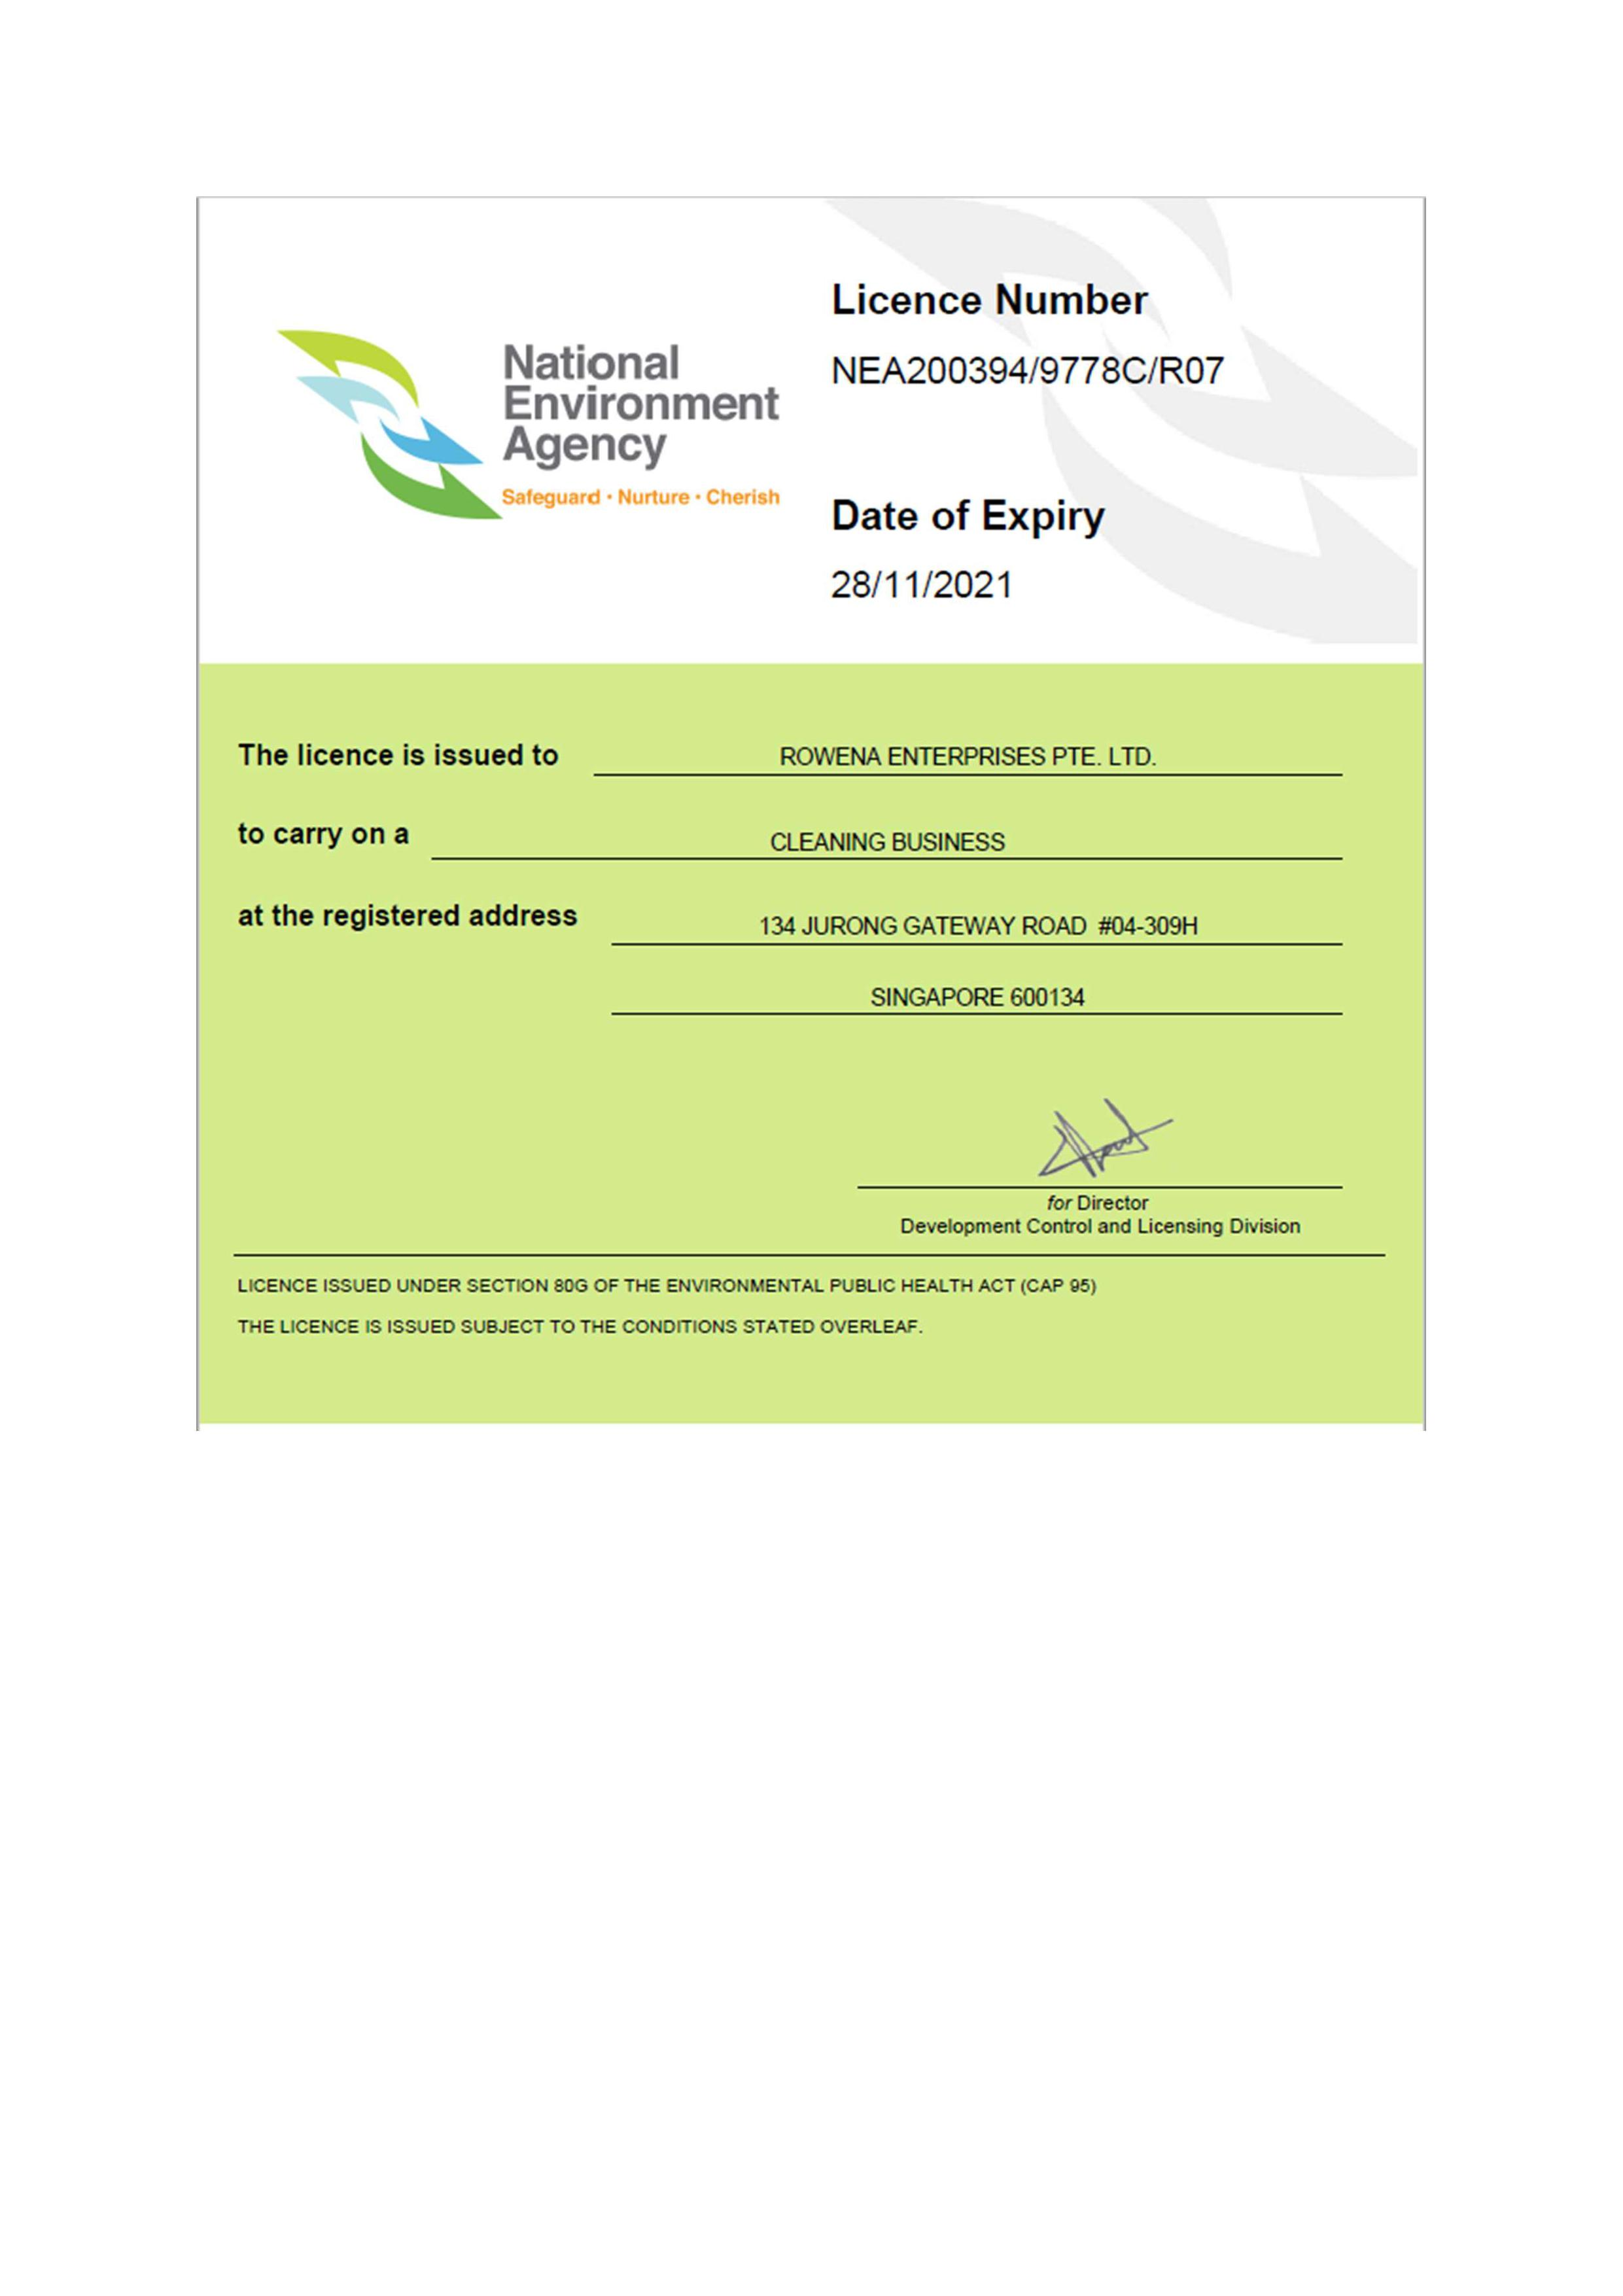 National Environment Agency